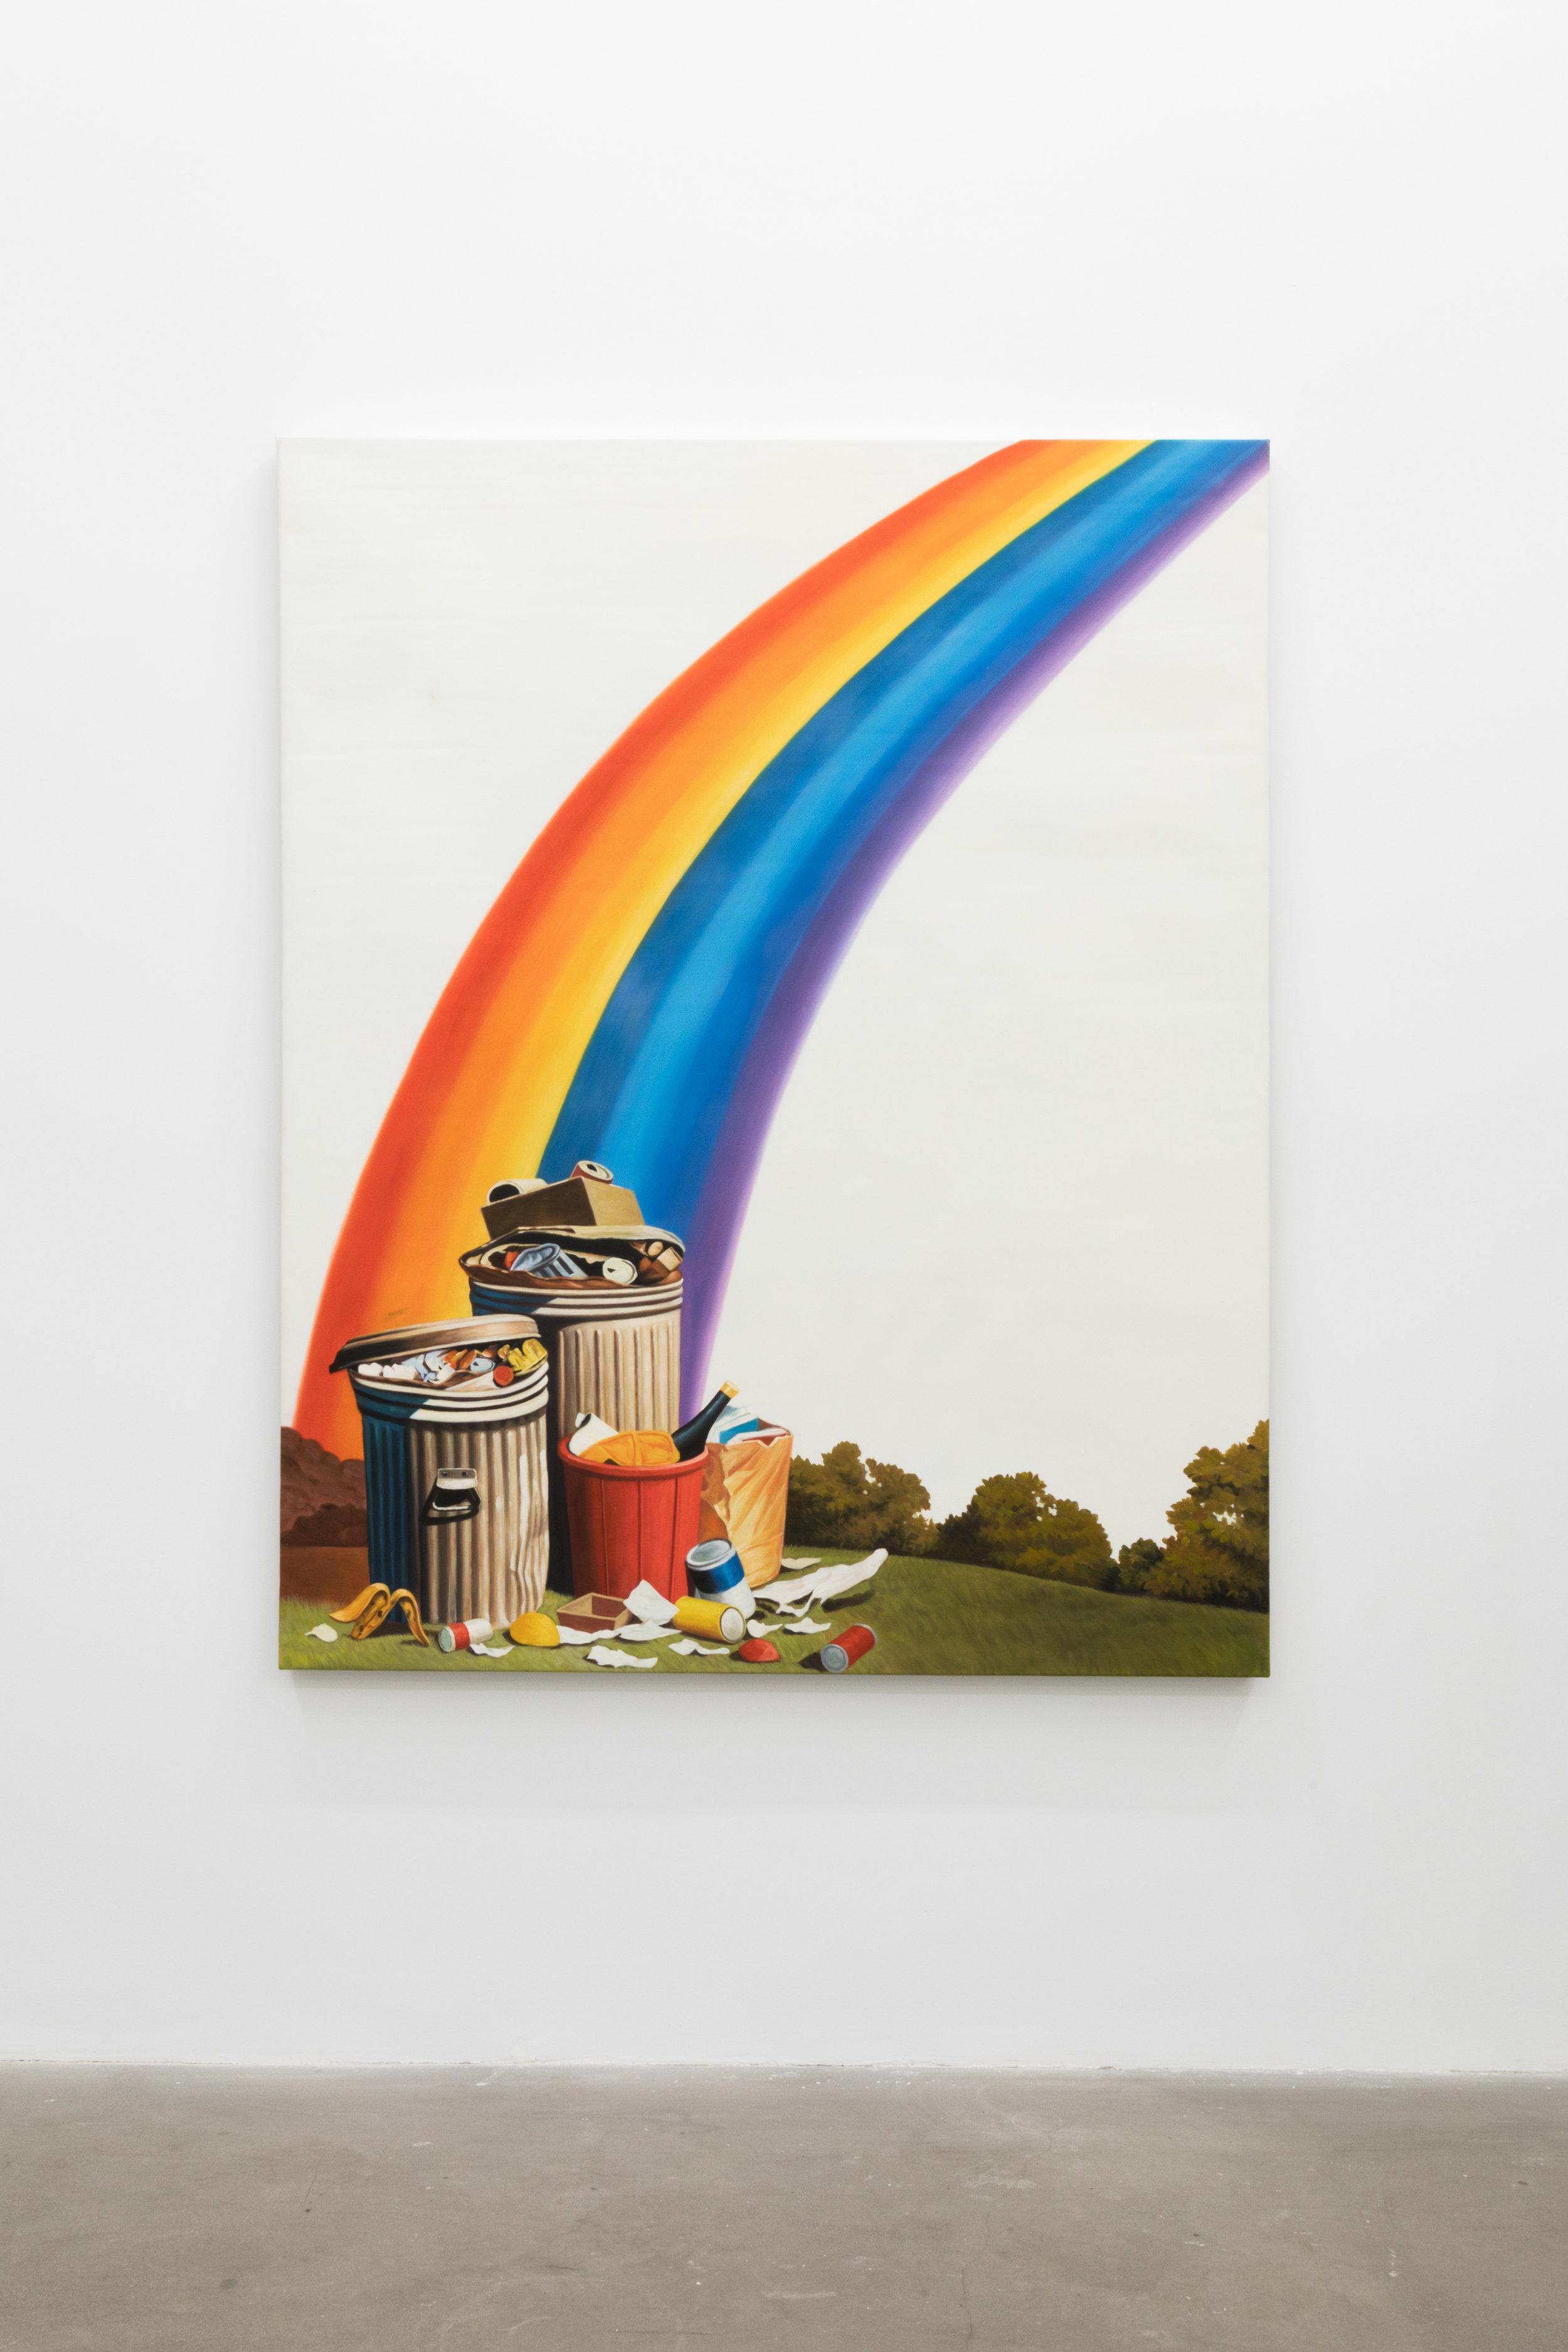 Jesse Harris,  Rainbow Blight , 2018, Oil on Canvas, 48 x 36 in (121.9 x 91.4 cm)